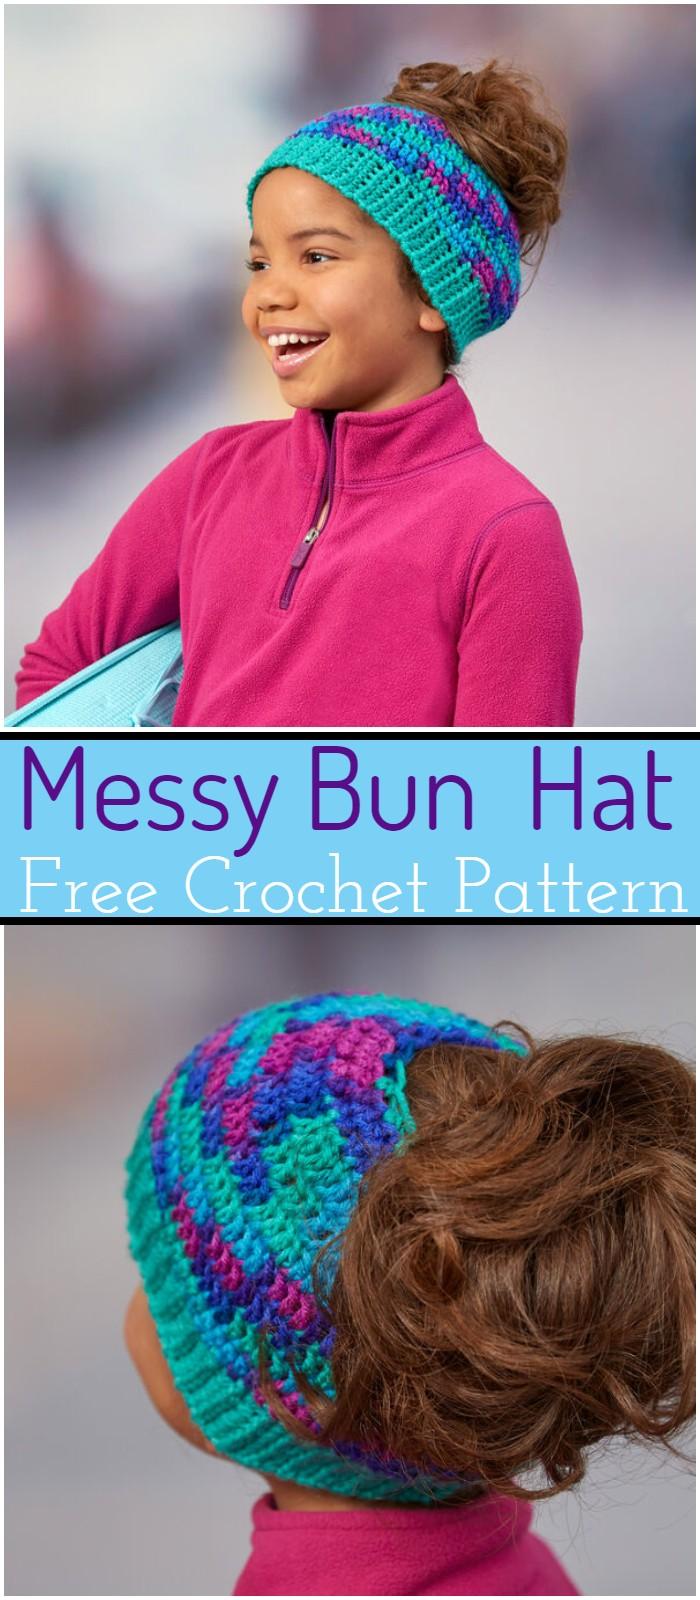 Messy Bun Crochet Hat Patterns